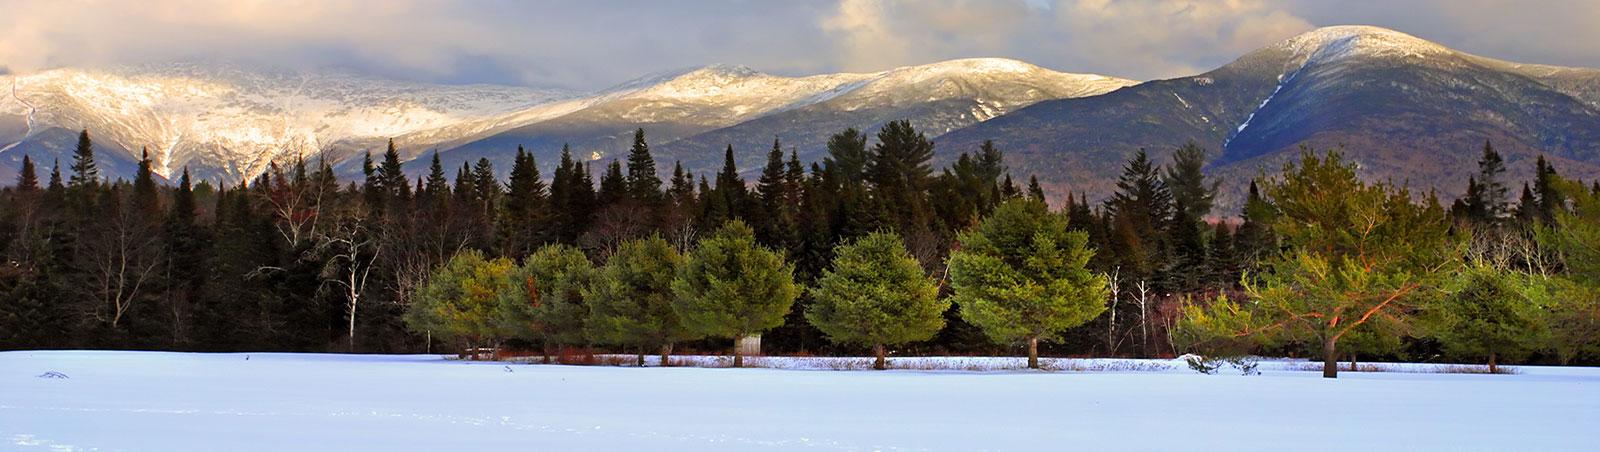 Bretton Woods, New Hampshire, inspireski